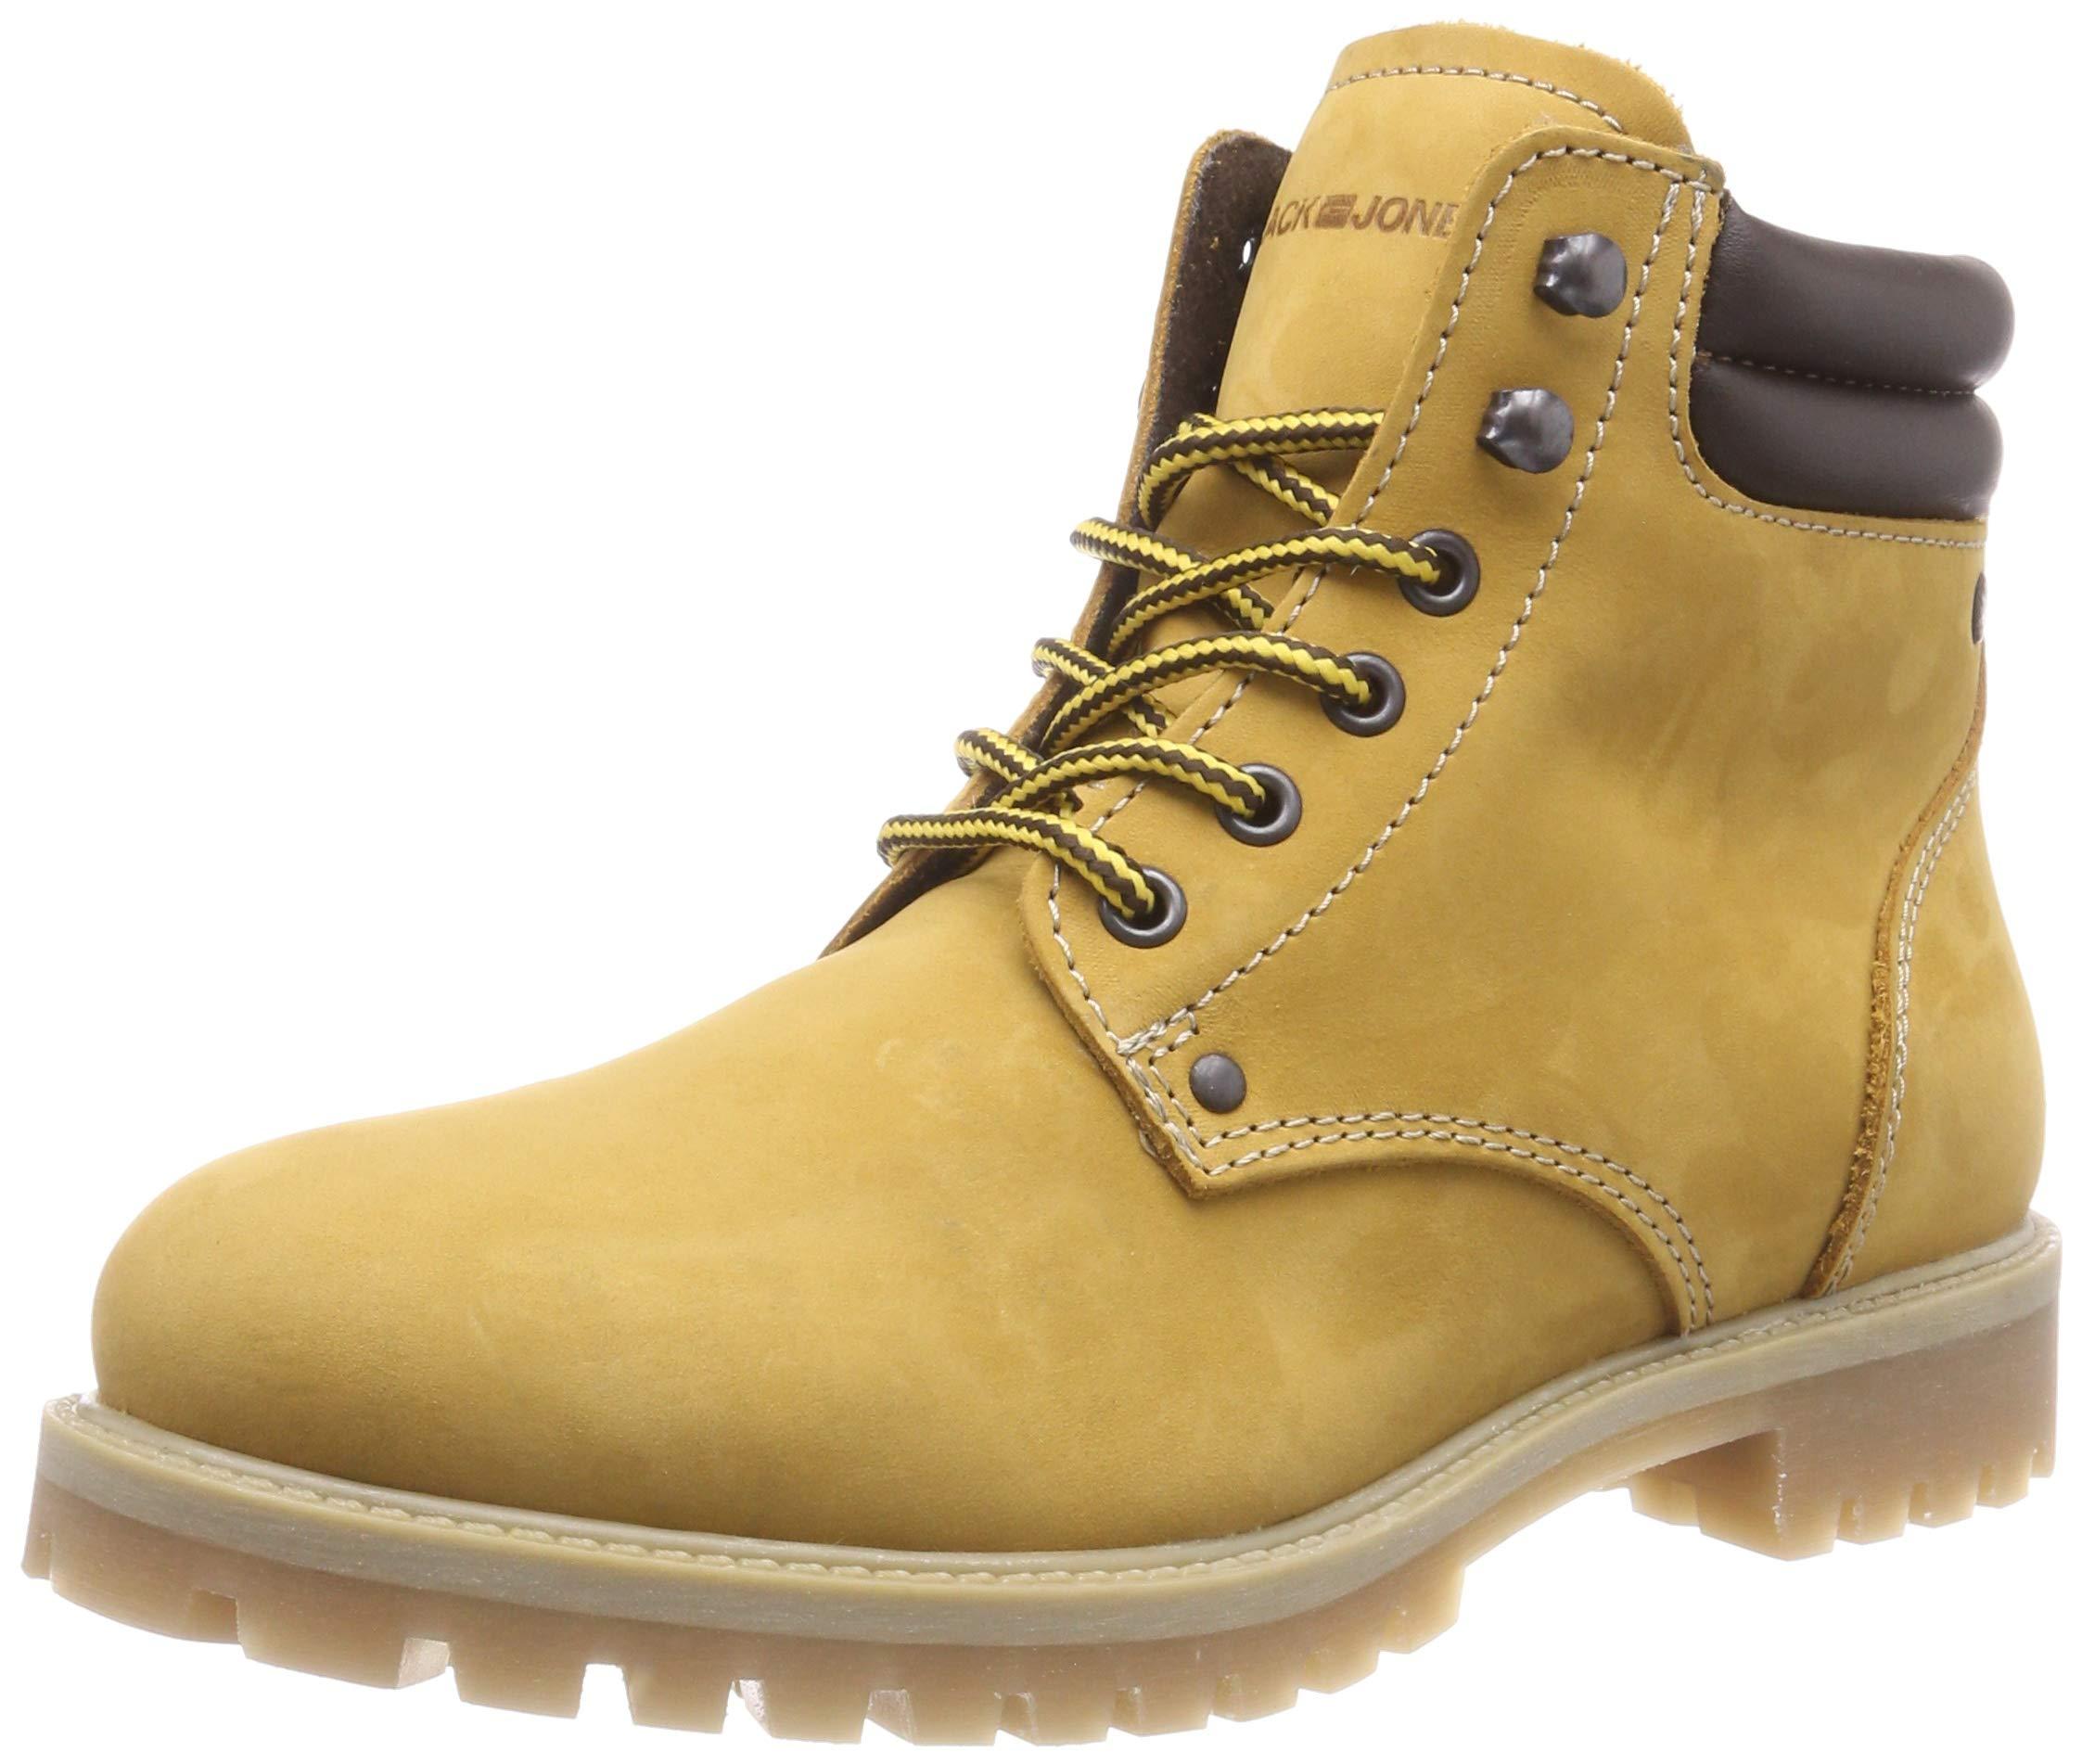 Classiques Eu Jfwstoke Honey Jones NoosBottes Bottines Nubuck Jackamp; HommeJaune43 Boot N8nmvw0